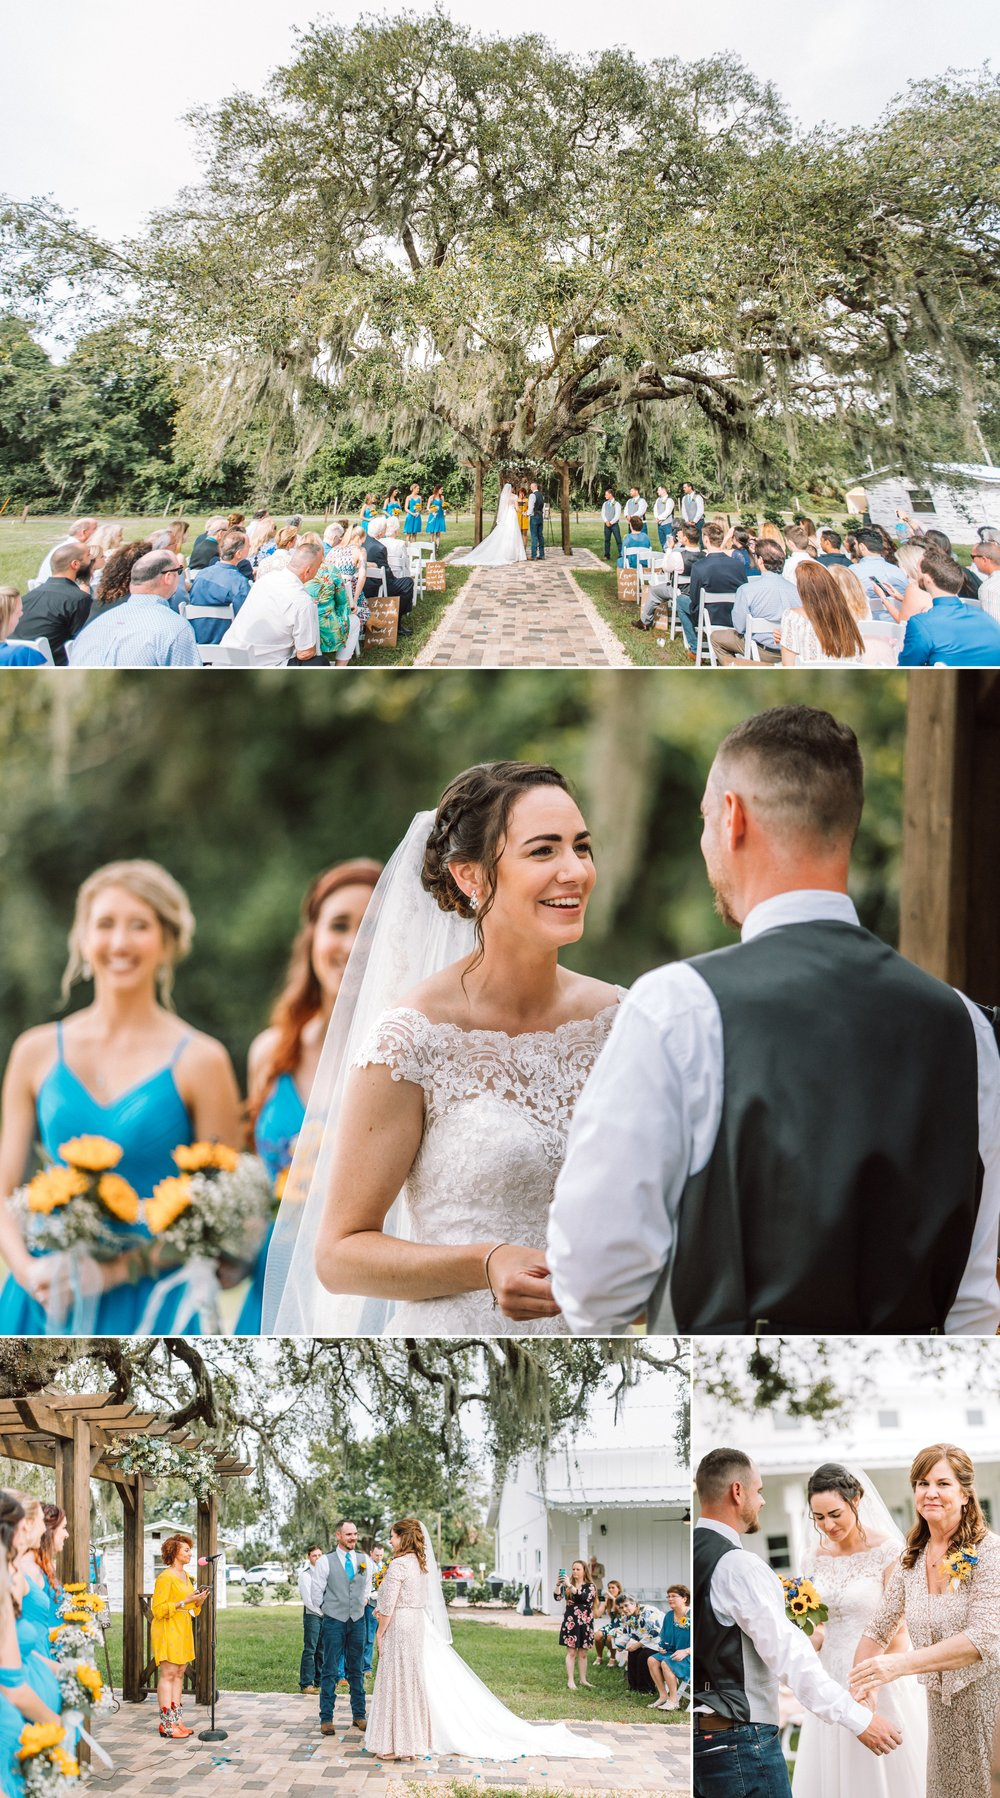 Rustic Sunflower & Blueberry Barn Wedding- Ever After Farms - Allie & NickBlog 17.jpg